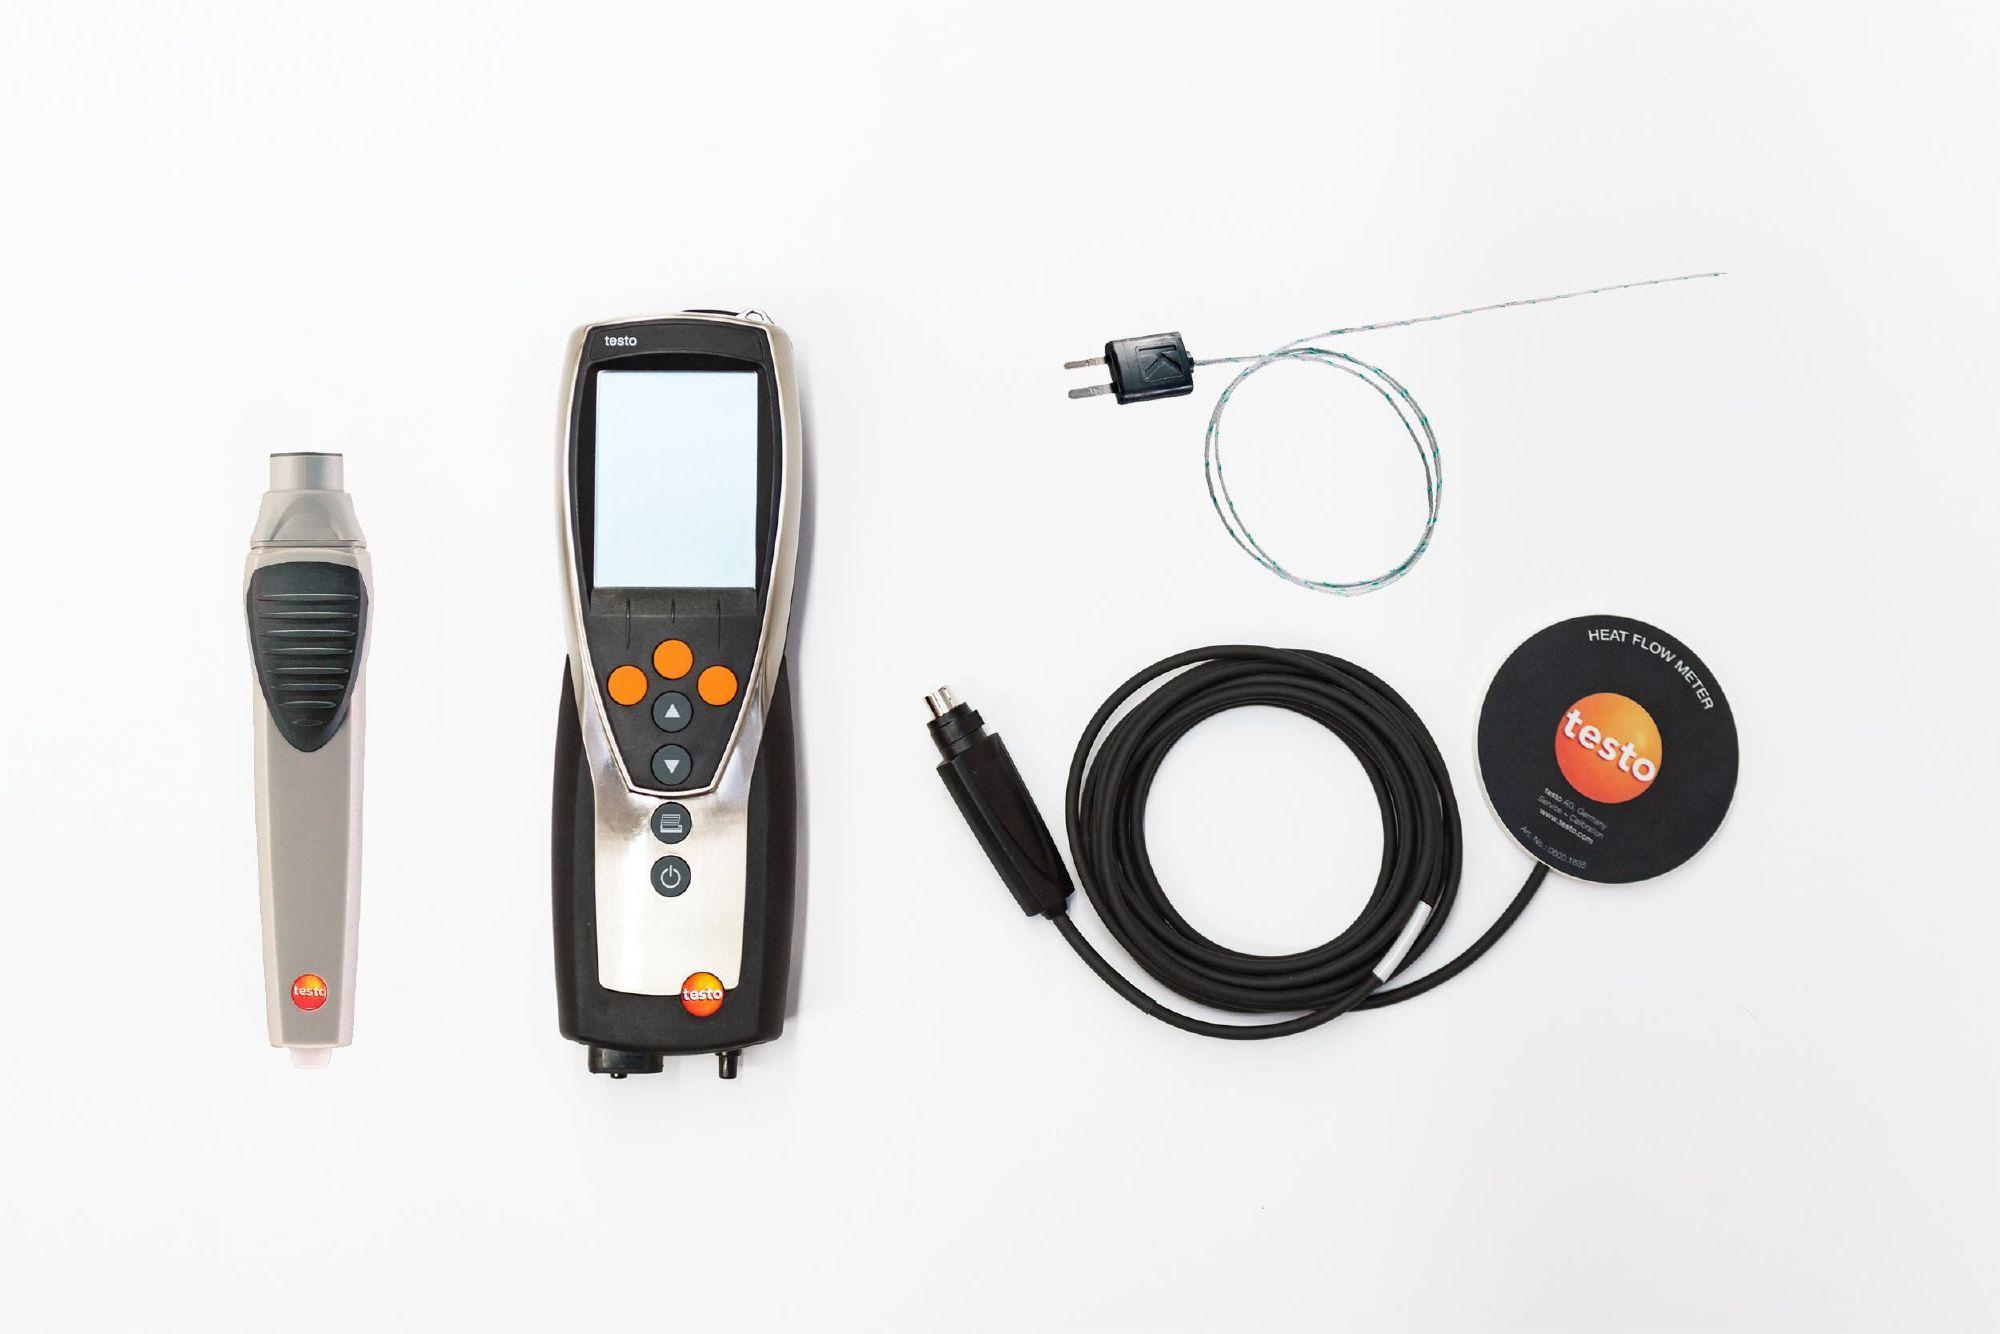 testo 435 termoflussimetro